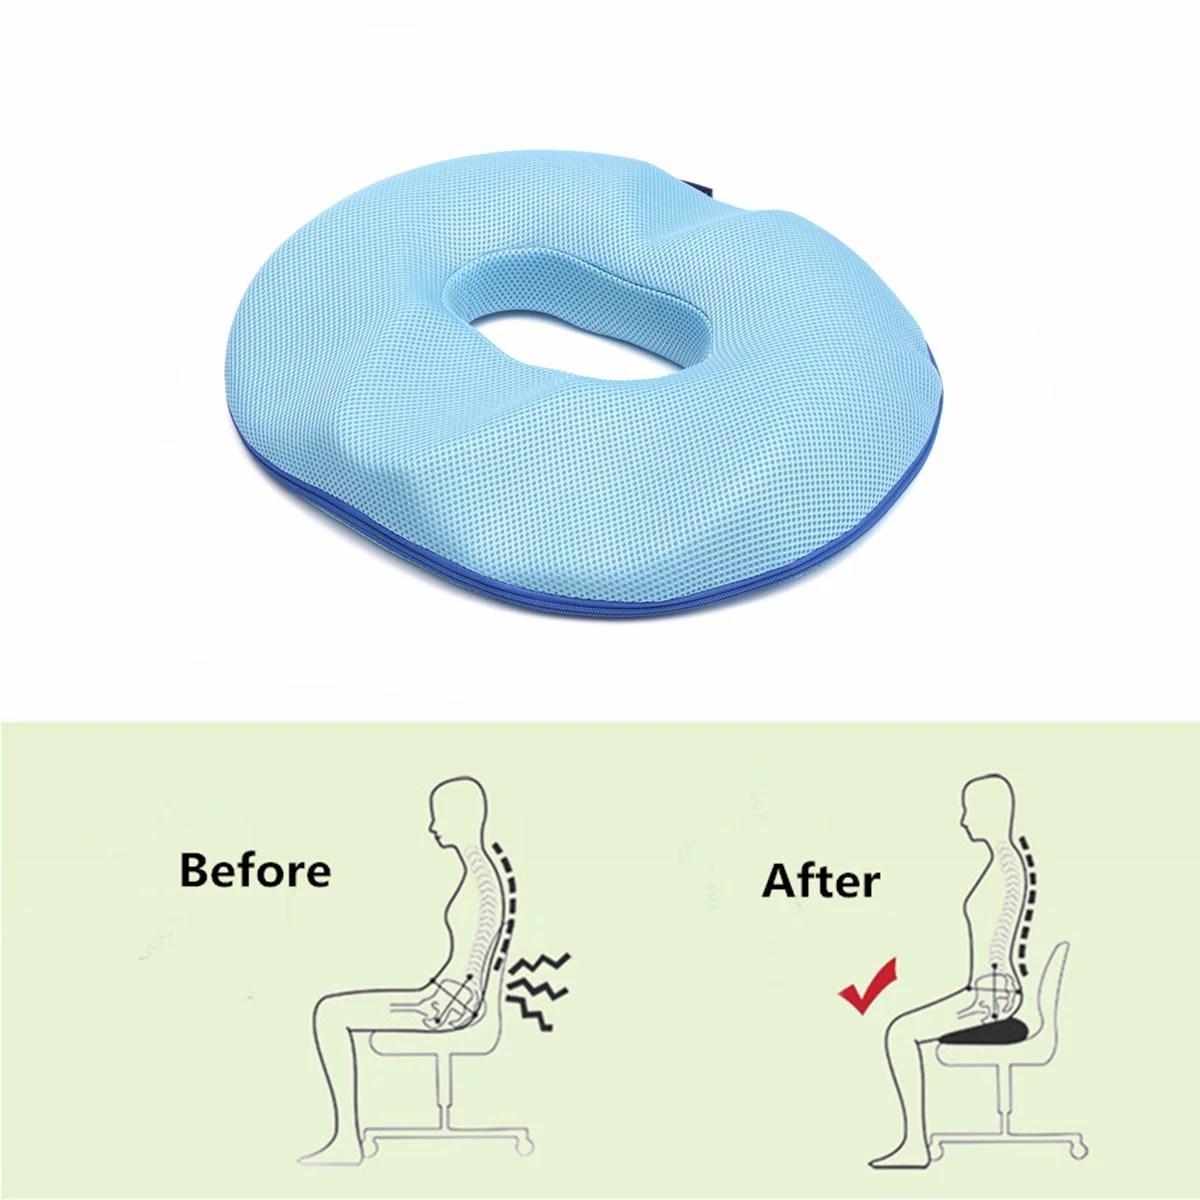 men donut tailbone pillow hemorrhoid cushion donut seat cushion pain relief hemmoroid treatment bed sores prostate coccyx sciatica pregnancy